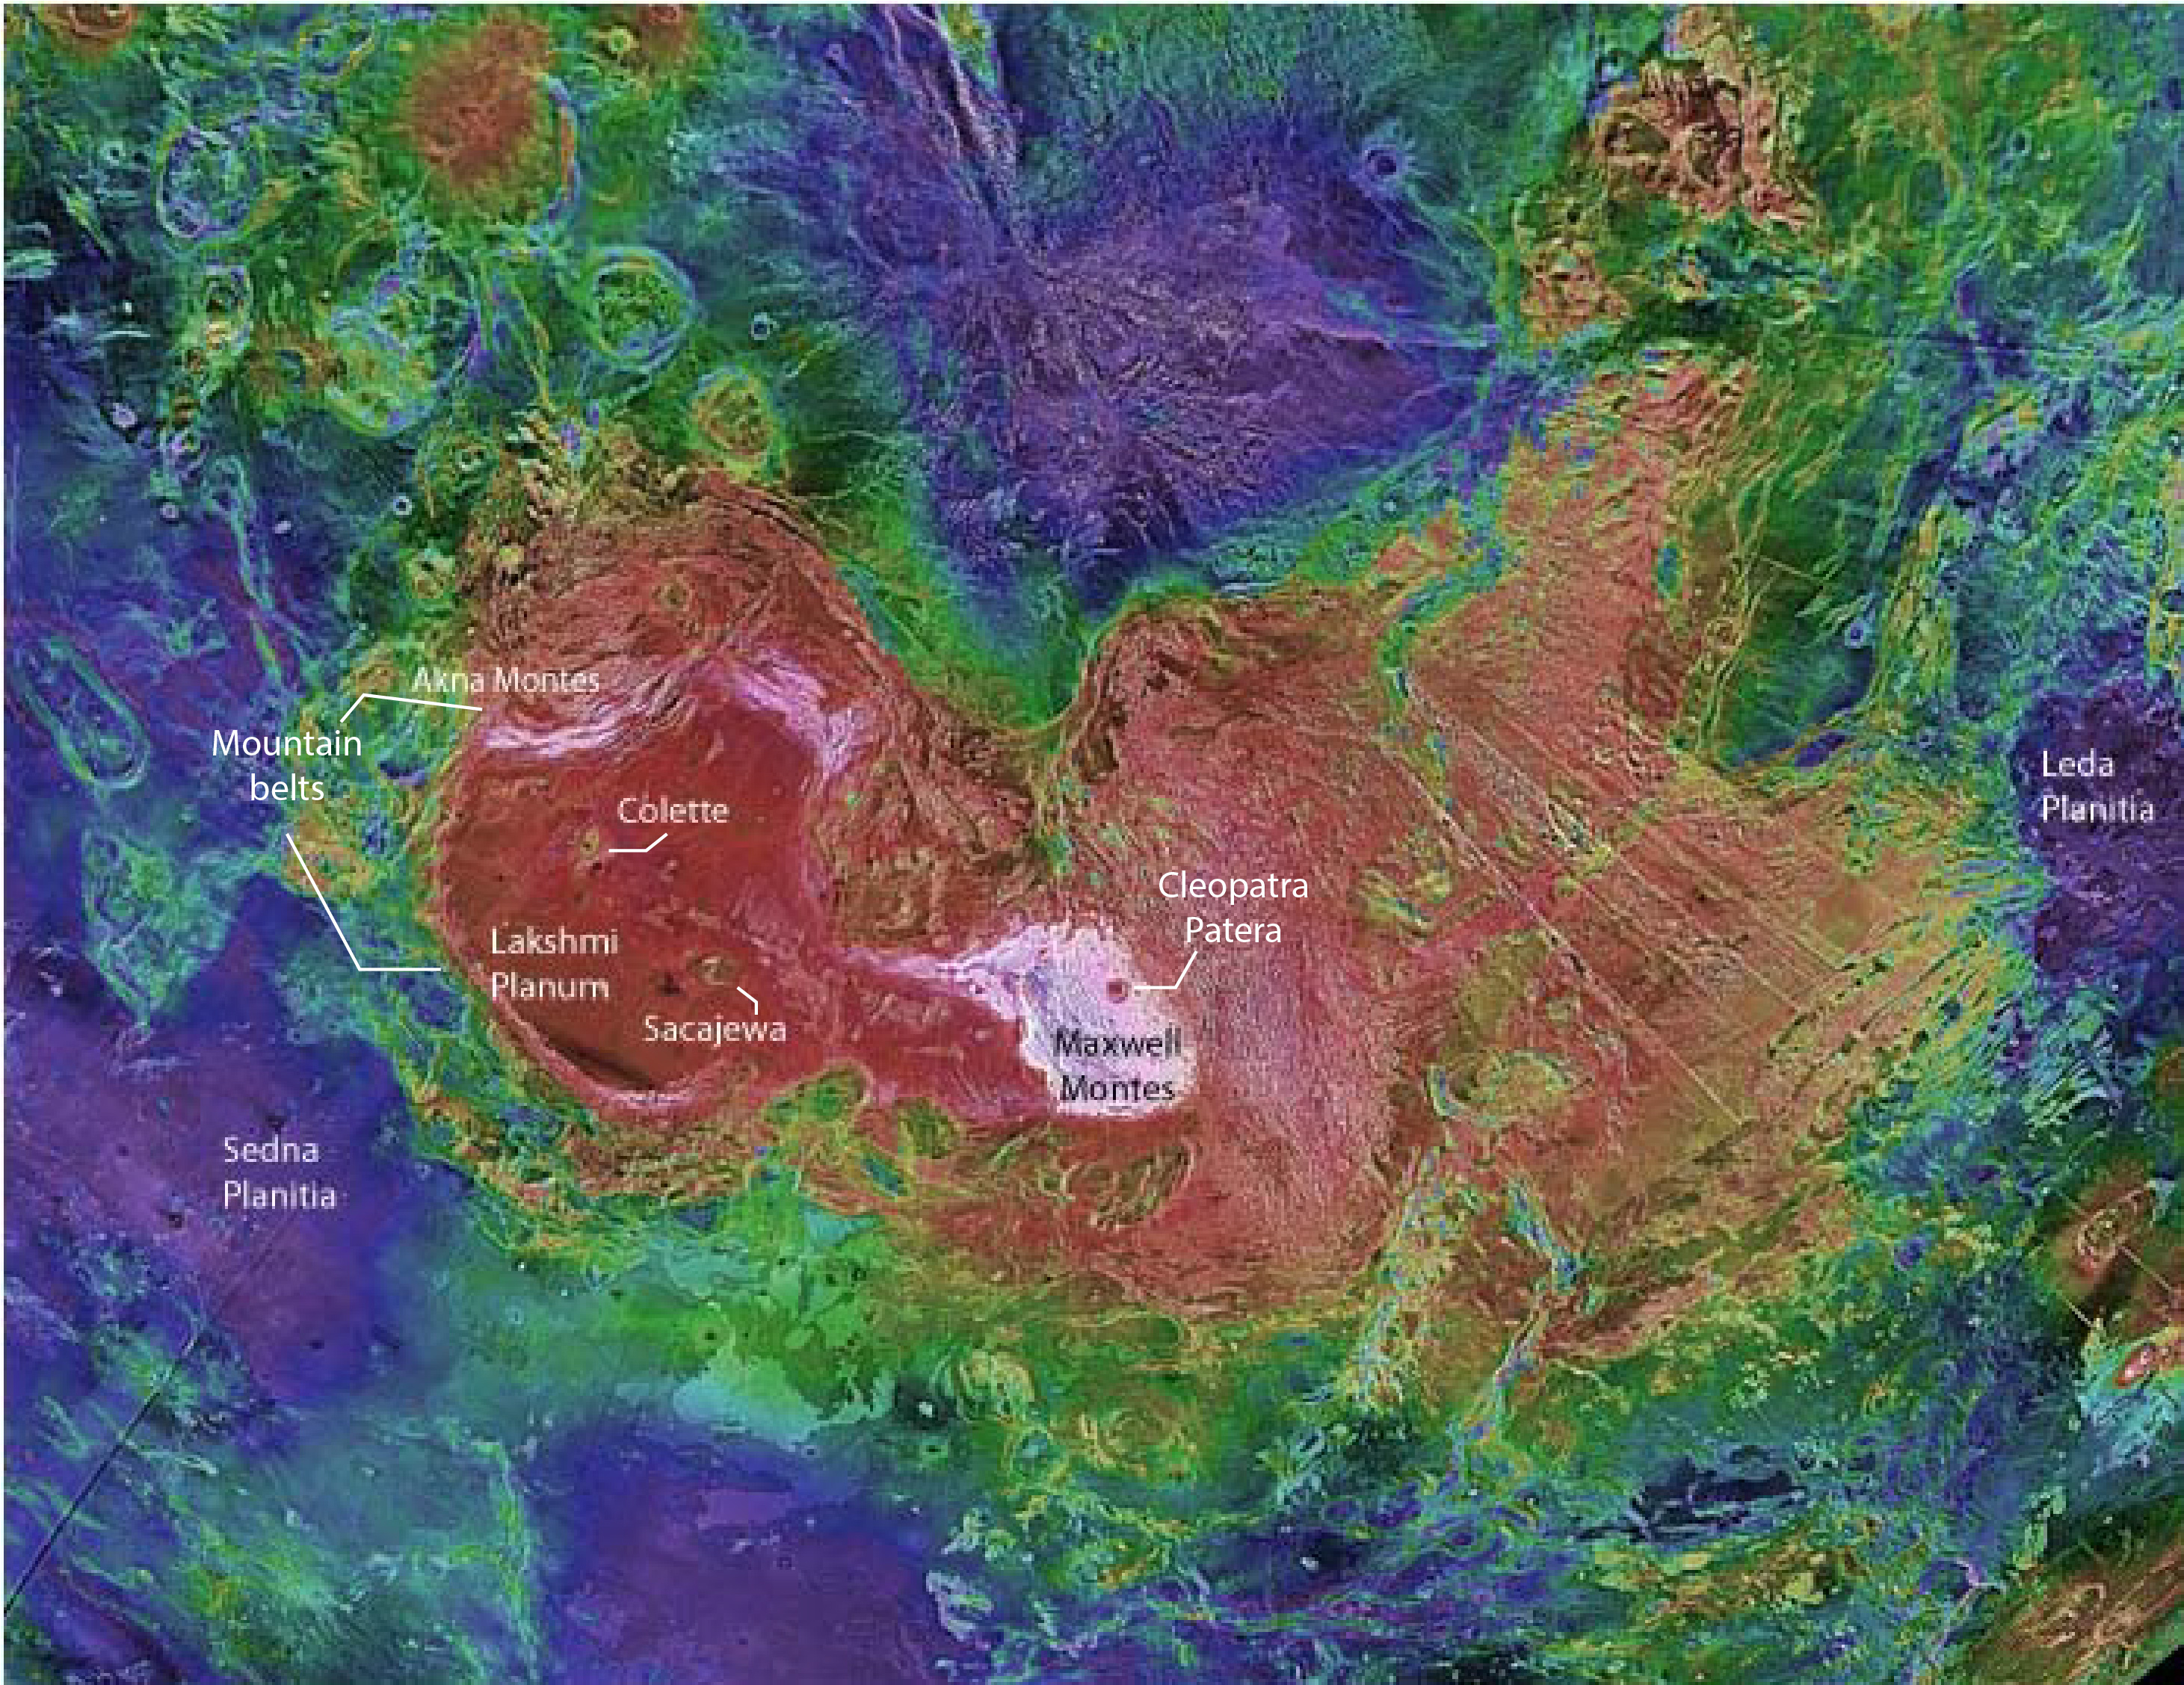 7. Venus on globe of venus, solar system of venus, geography of venus, physical features of venus, lakes of venus, earth of venus, regions of venus, colors of venus, cities of venus, poles of venus, landmarks of venus, oceans of venus, stars of venus, map of venus, atmosphere of venus, weather of venus, clouds of venus,